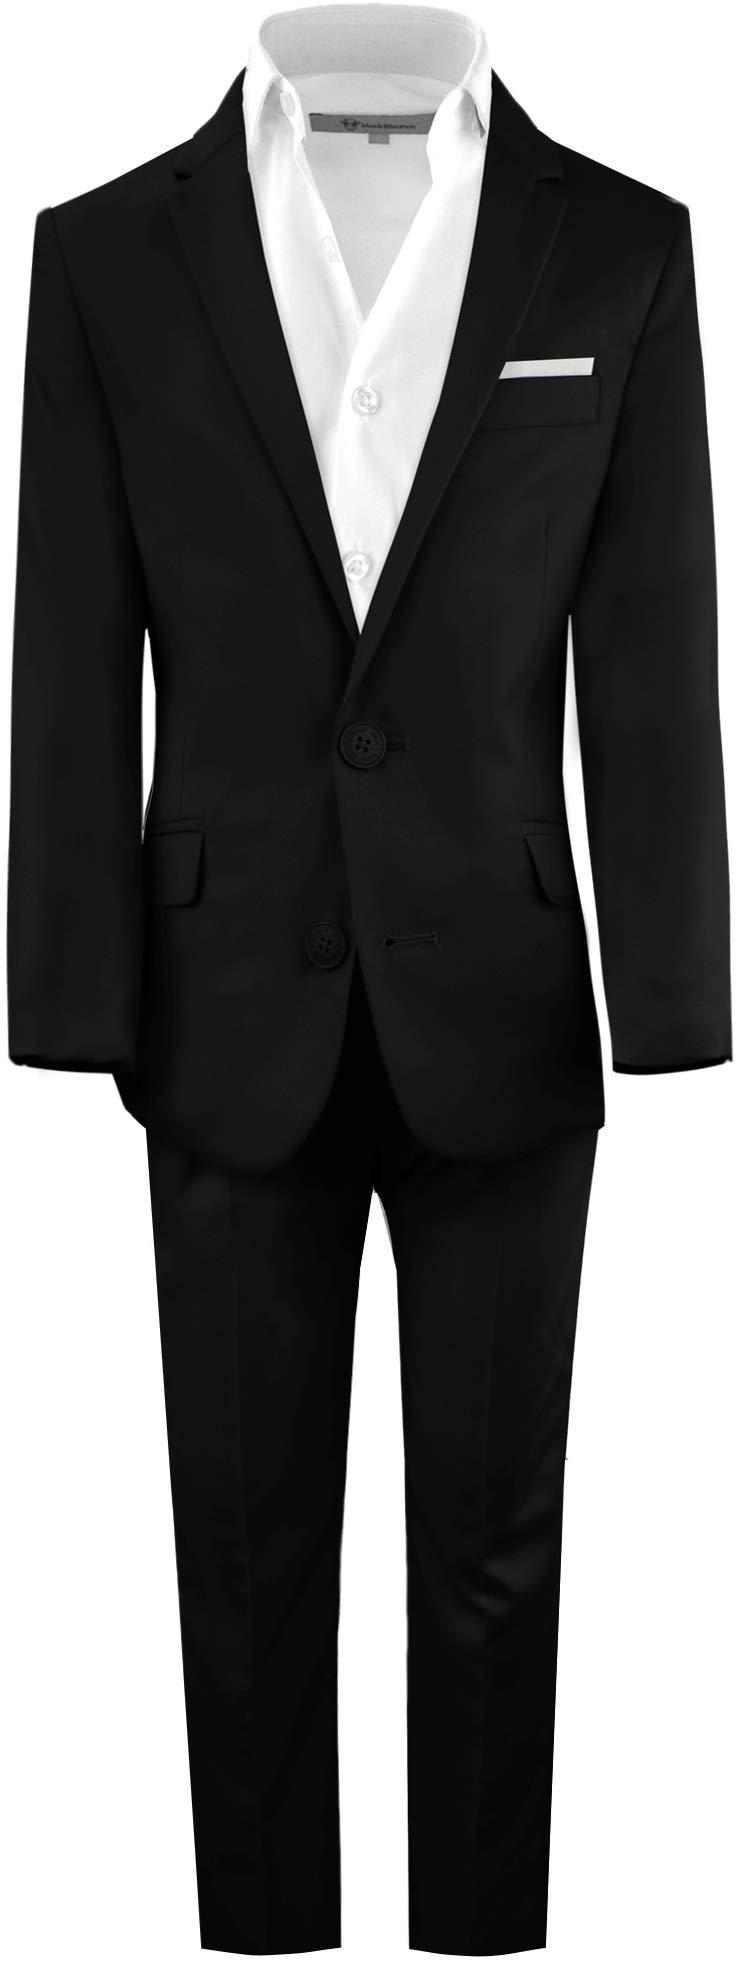 Black n Bianco Boys' First Class Slim Suits Black 12 by Black n Bianco (Image #1)